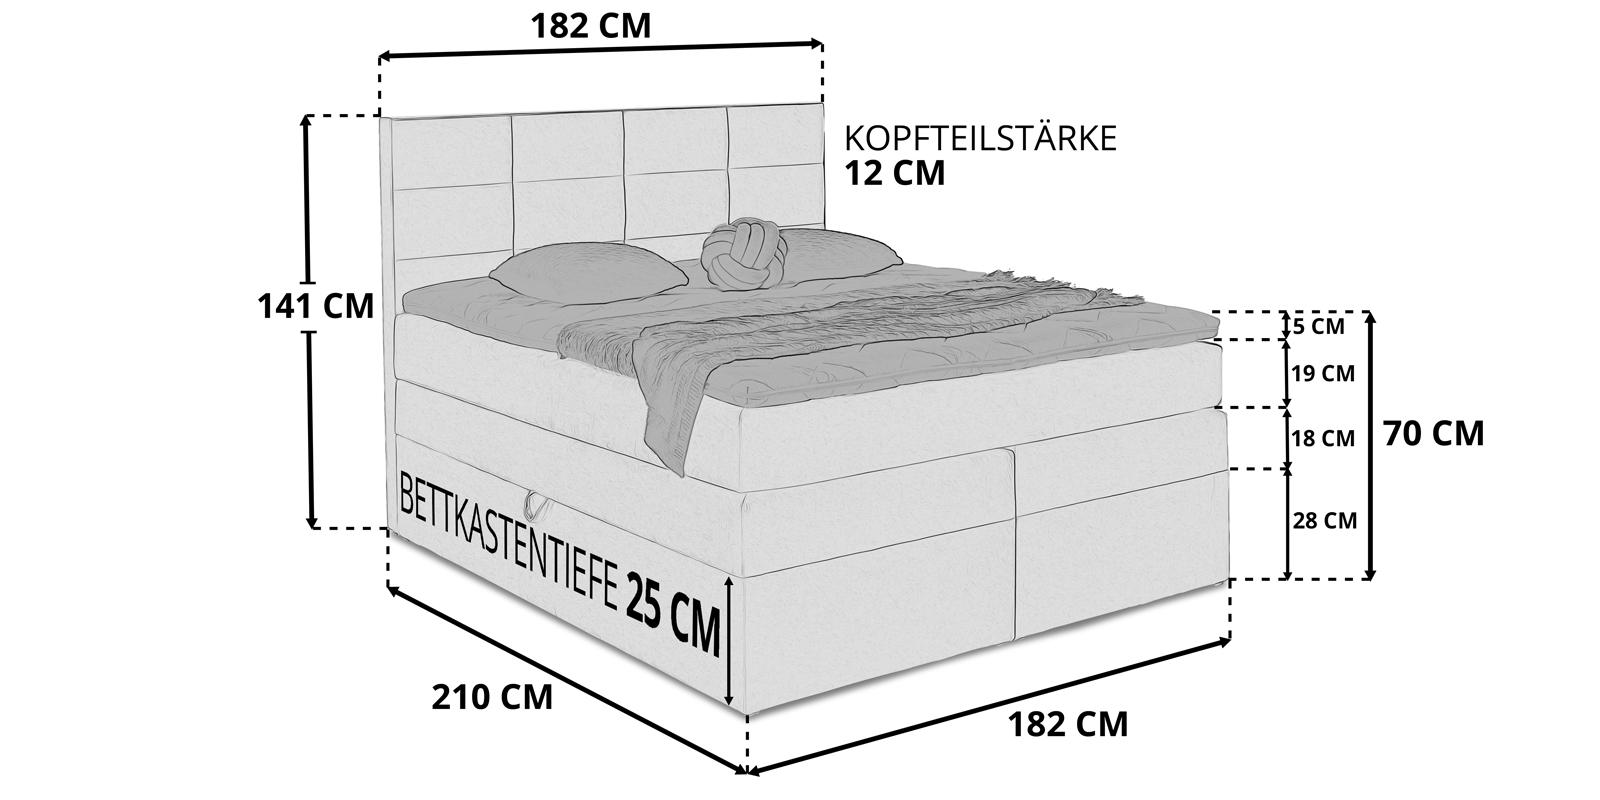 Boxspringbett Bettkasten Stauraum Bella 180x200 Skizze